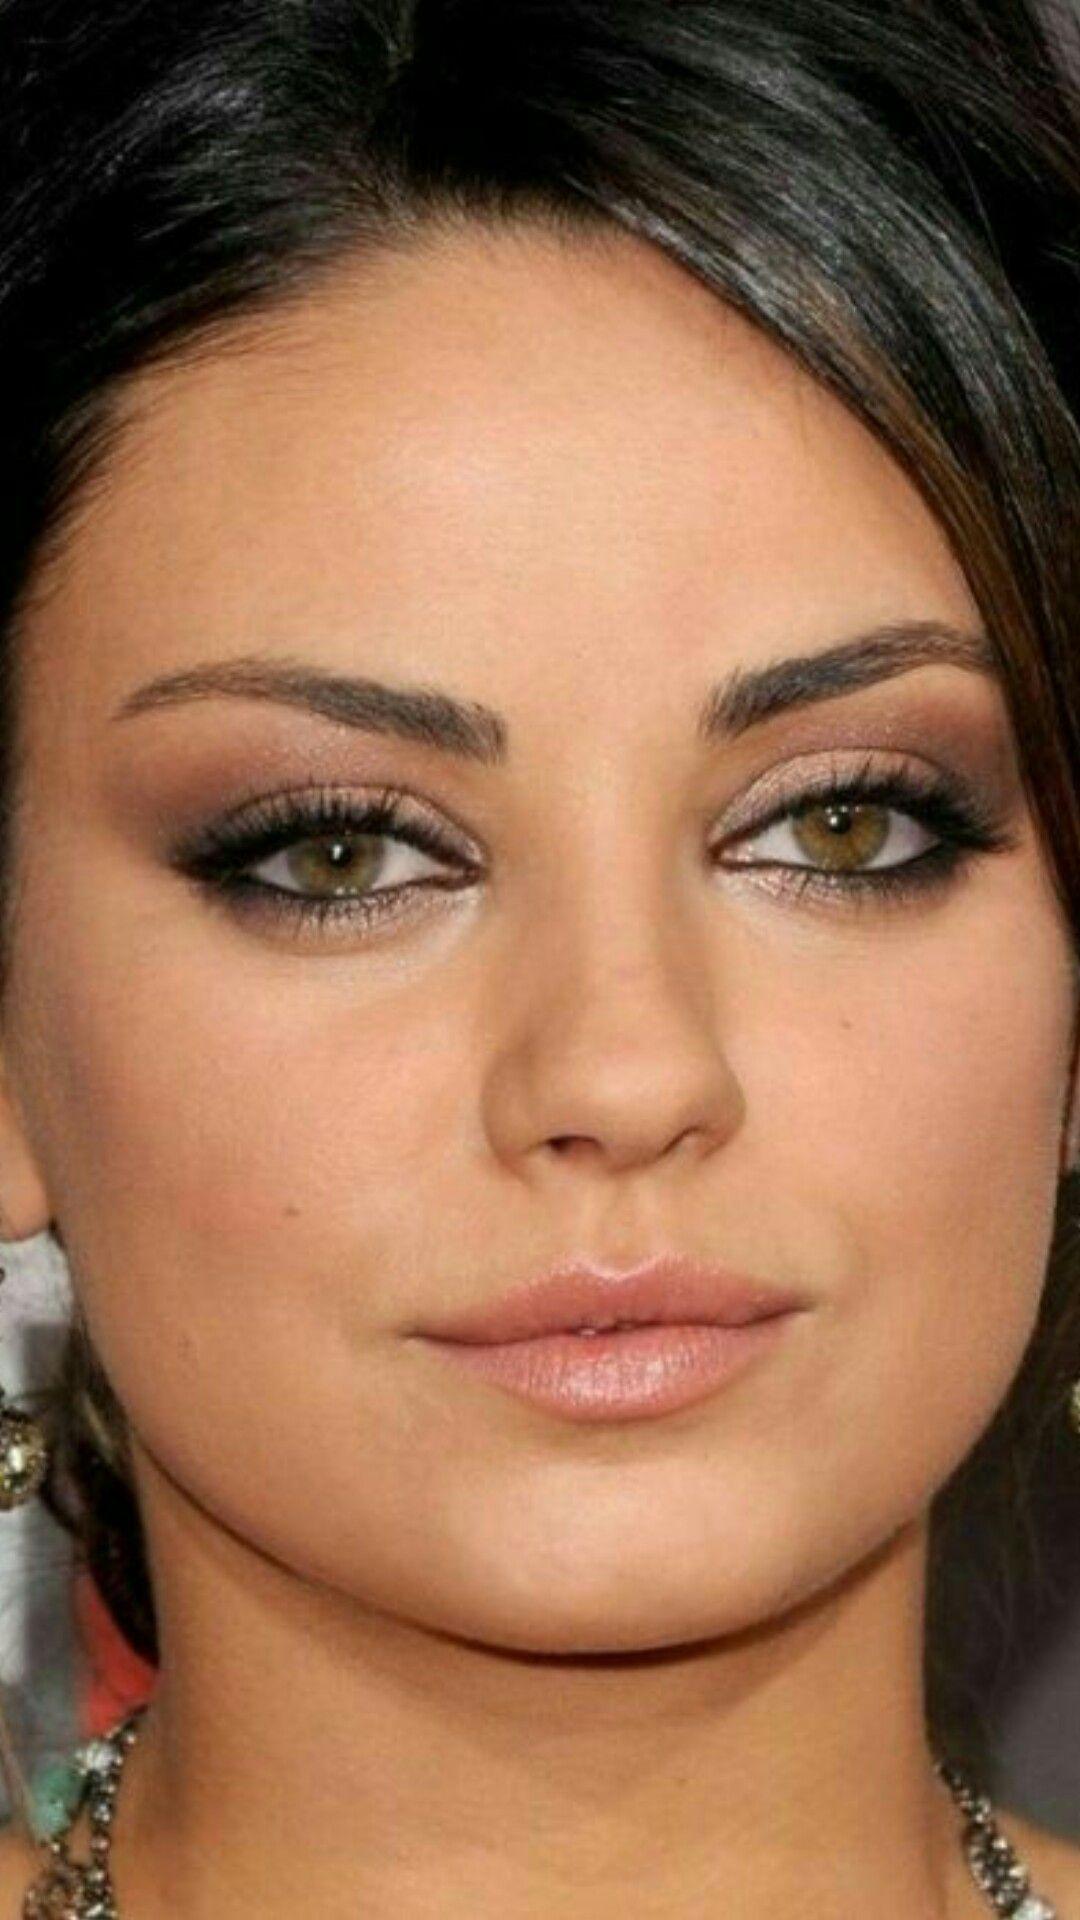 beautiful eyes mk | makeup for hazel eyes, amazing wedding